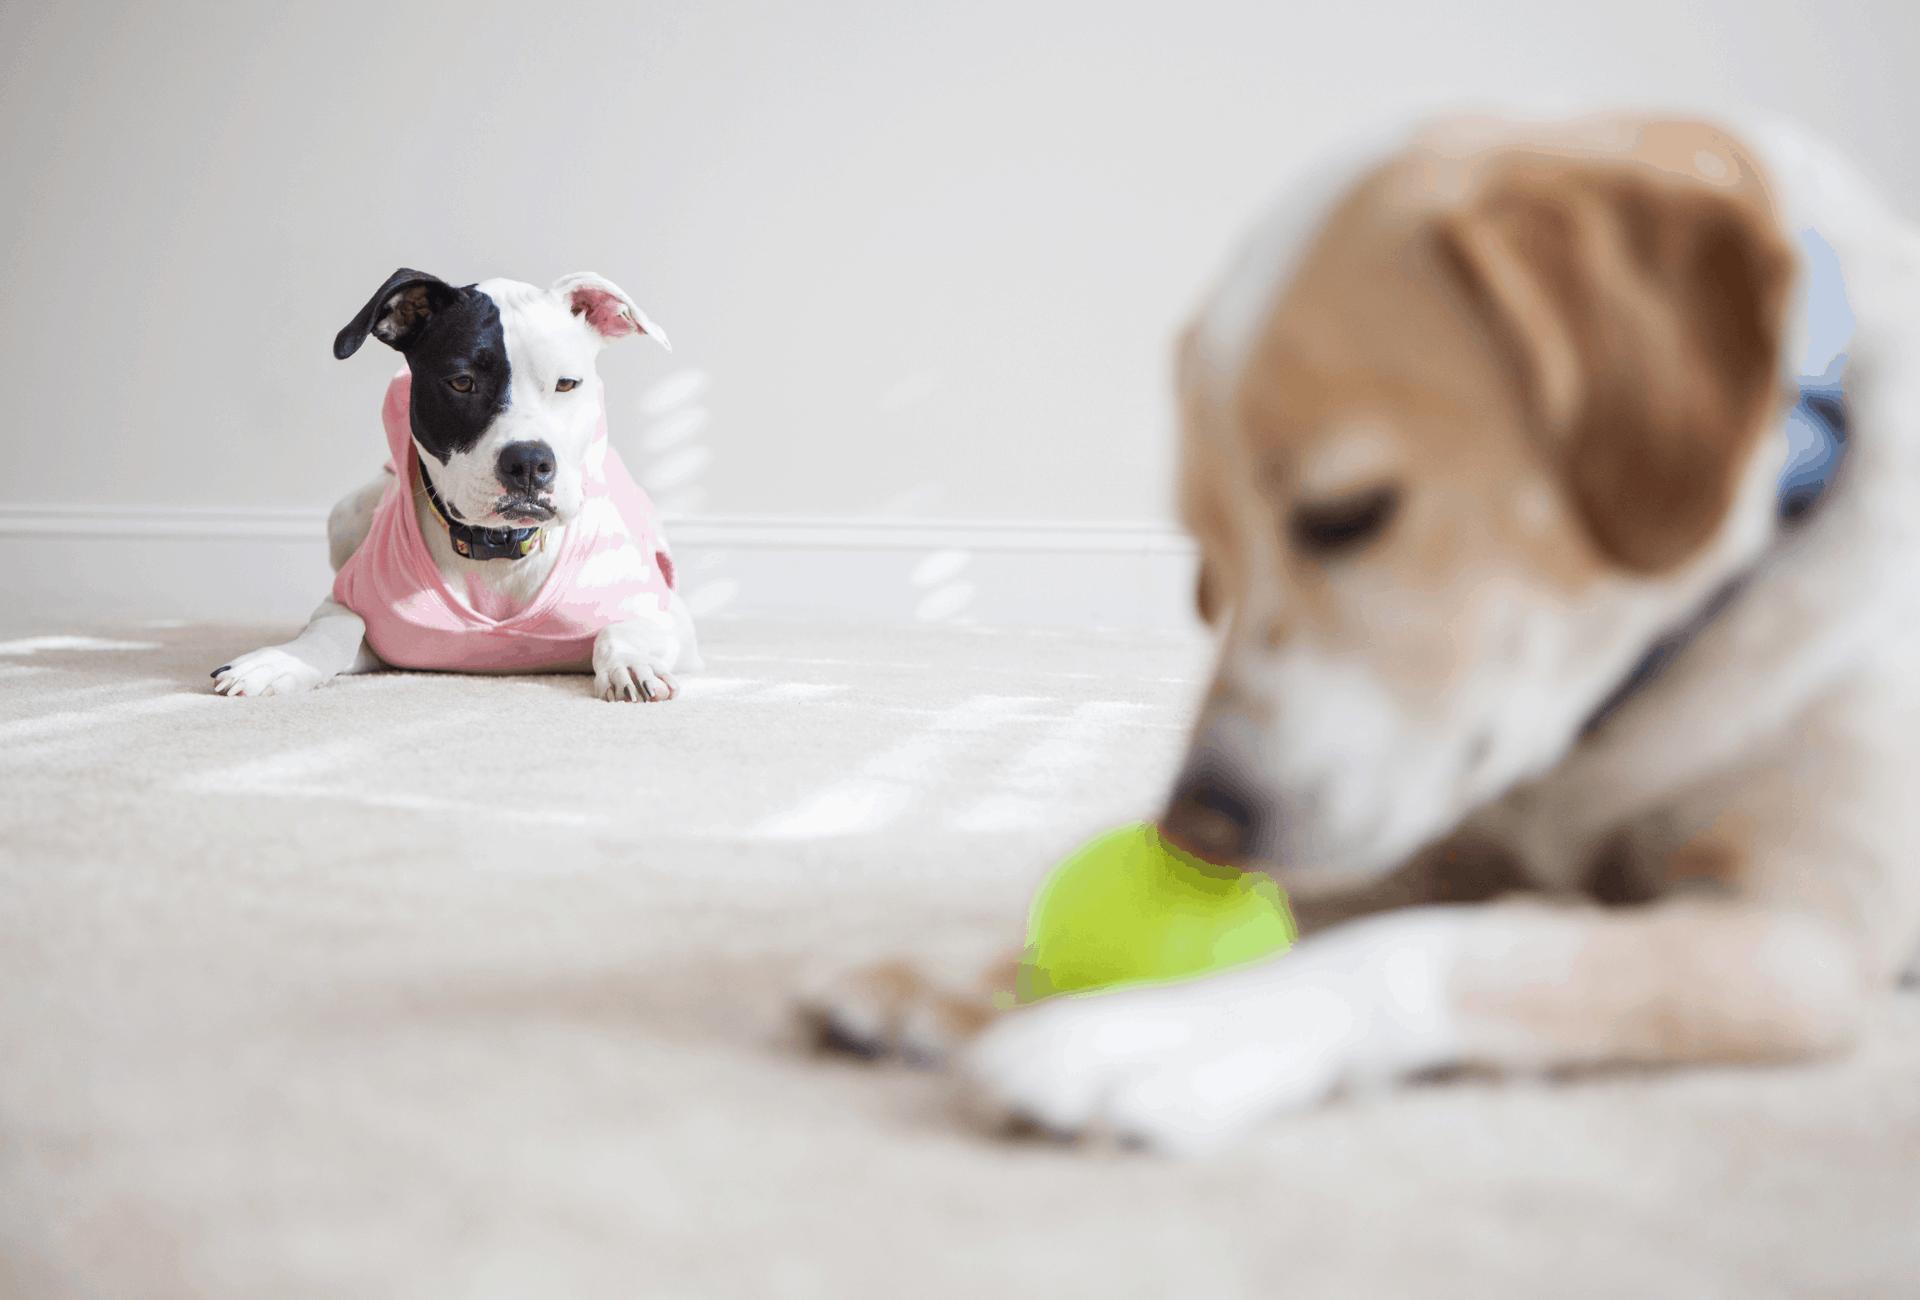 Pitbull jealous of other dog